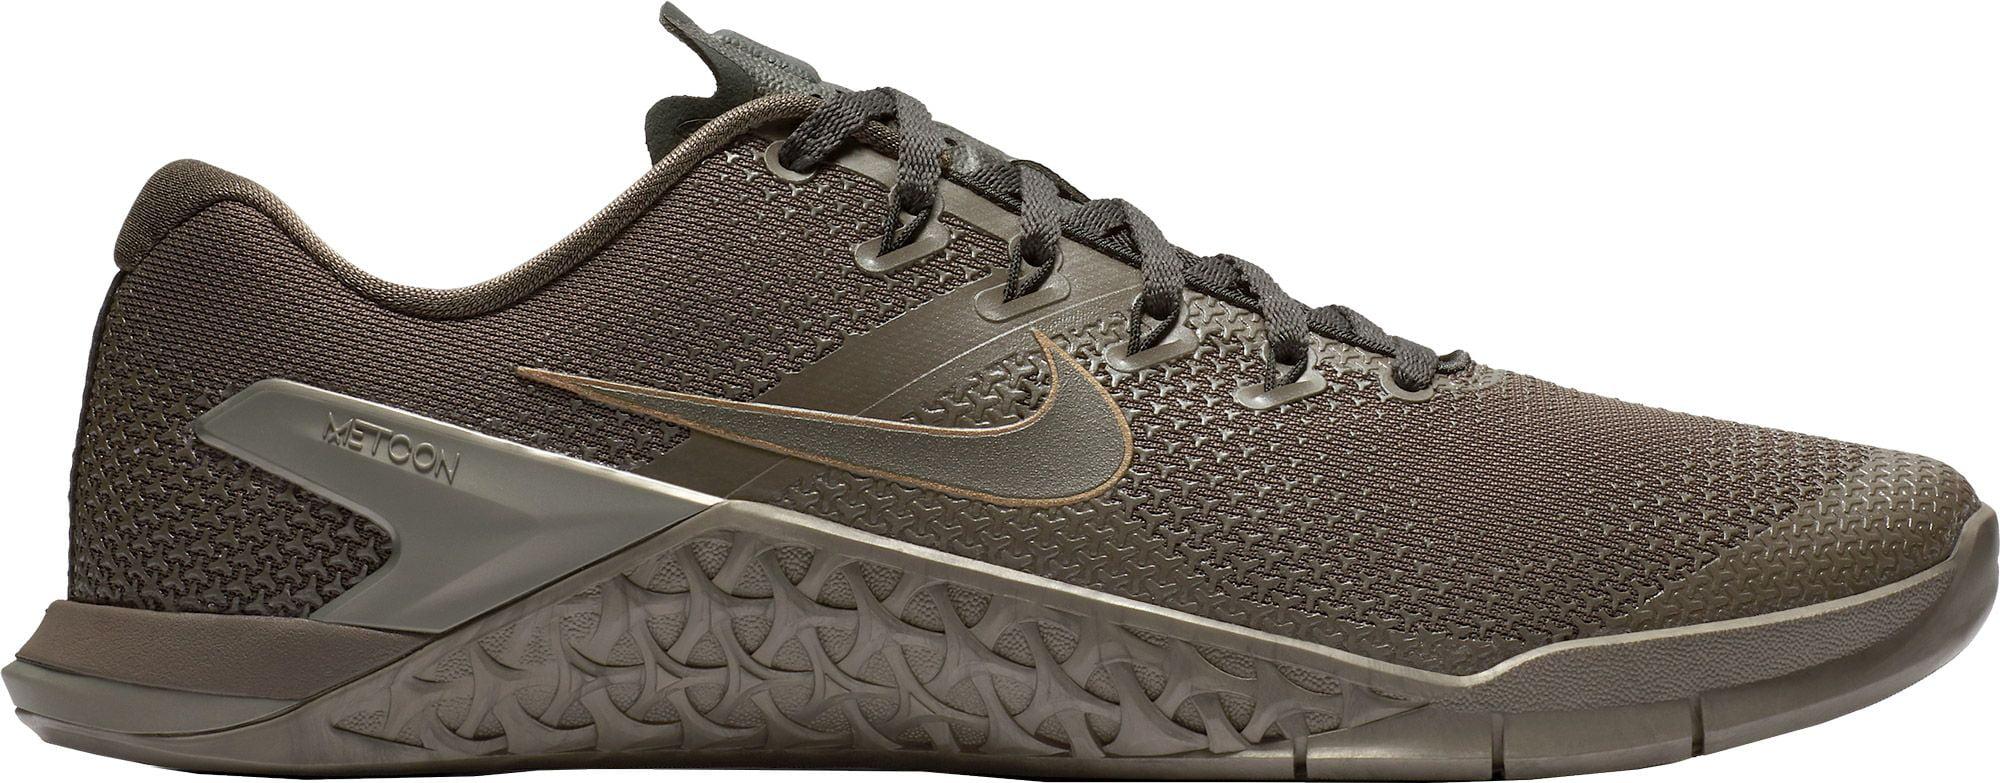 Nike - Nike Men's Metcon 4 Viking Quest